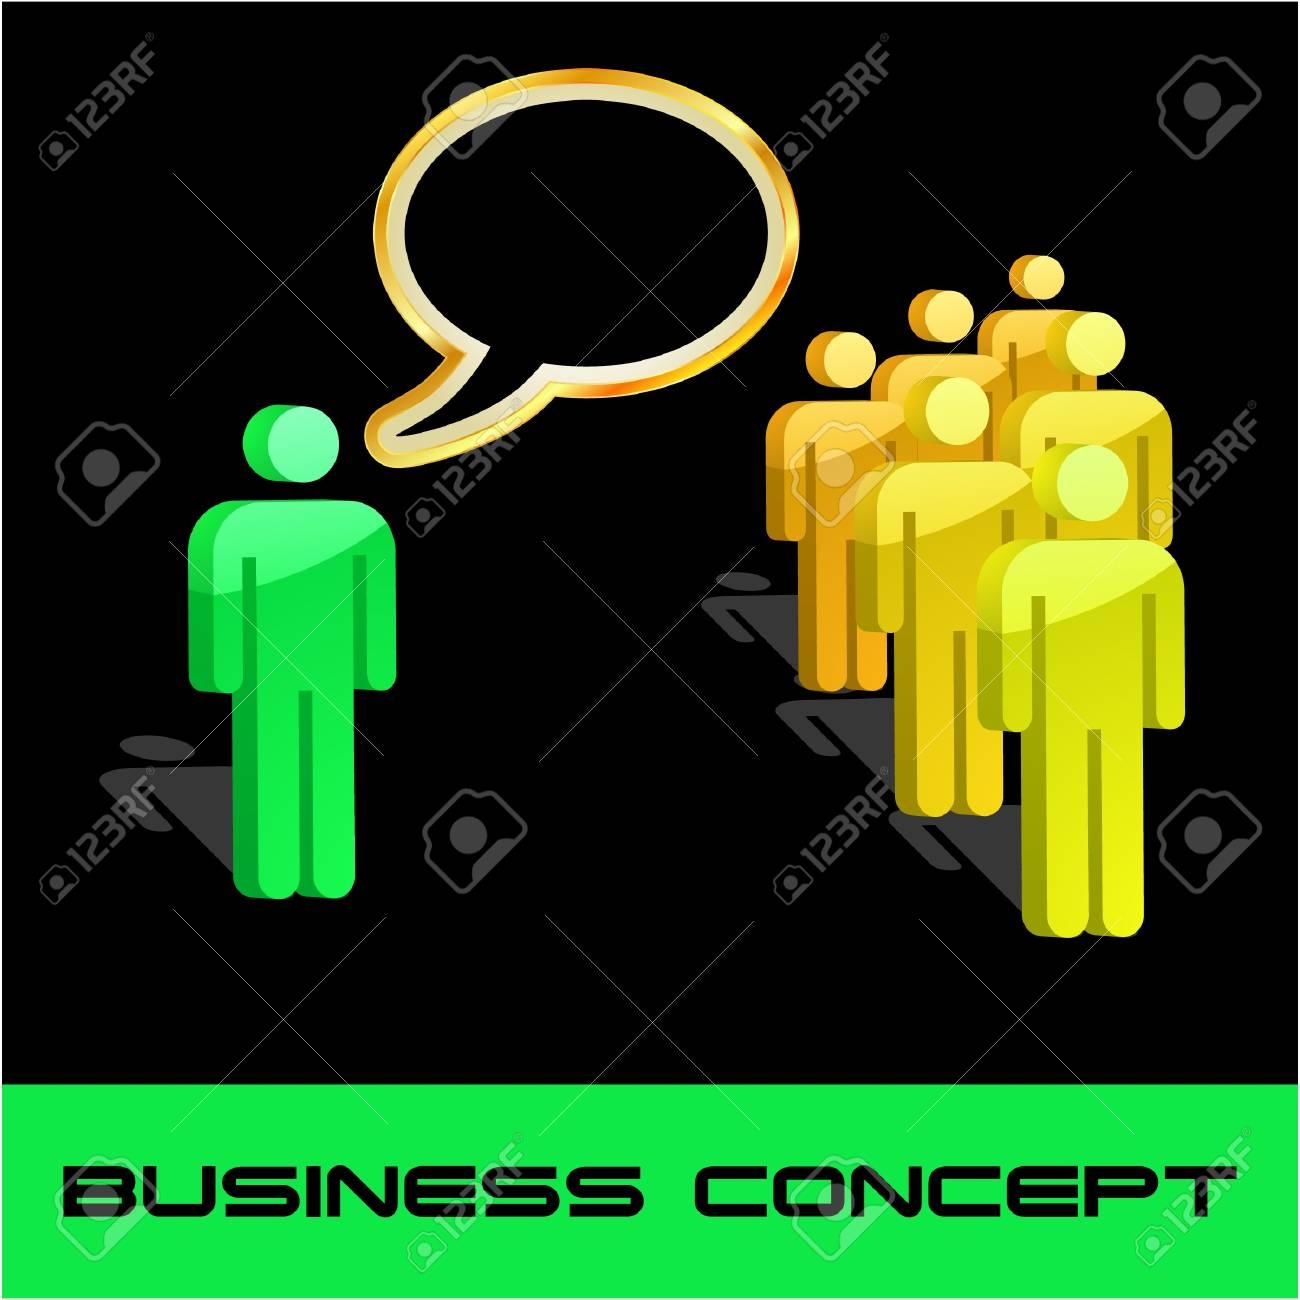 Speech business concept. illustration. Stock Vector - 7587314